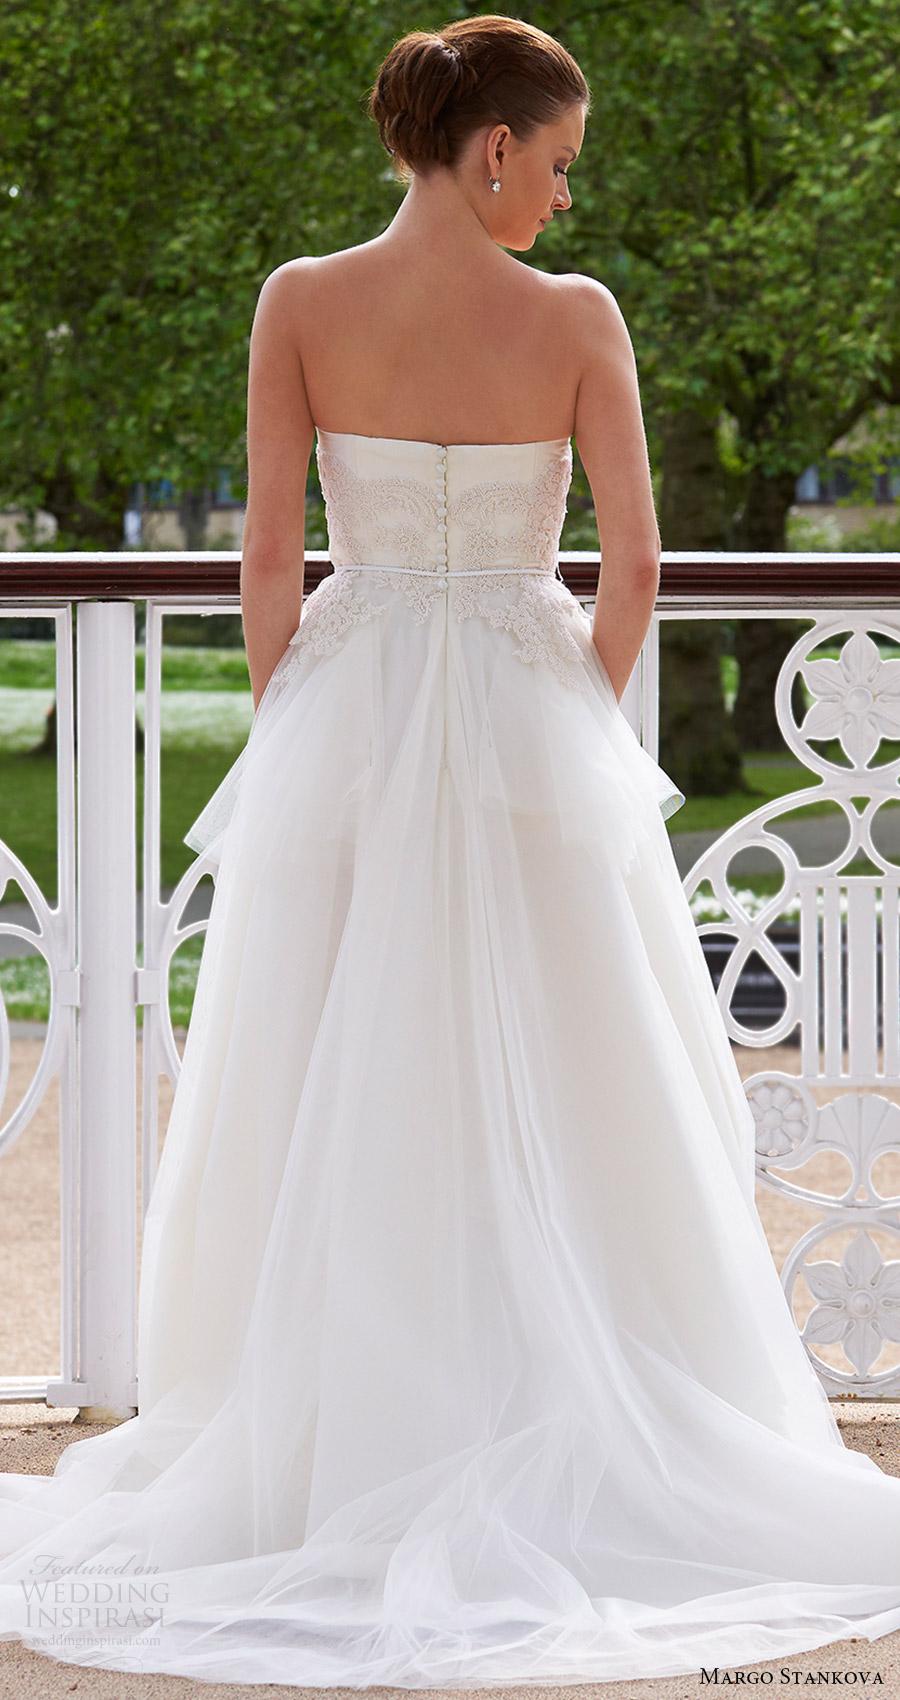 margo stankova bridal 2017 strapless sweetheart ball gown wedding dress (05) bv beaded bodice train